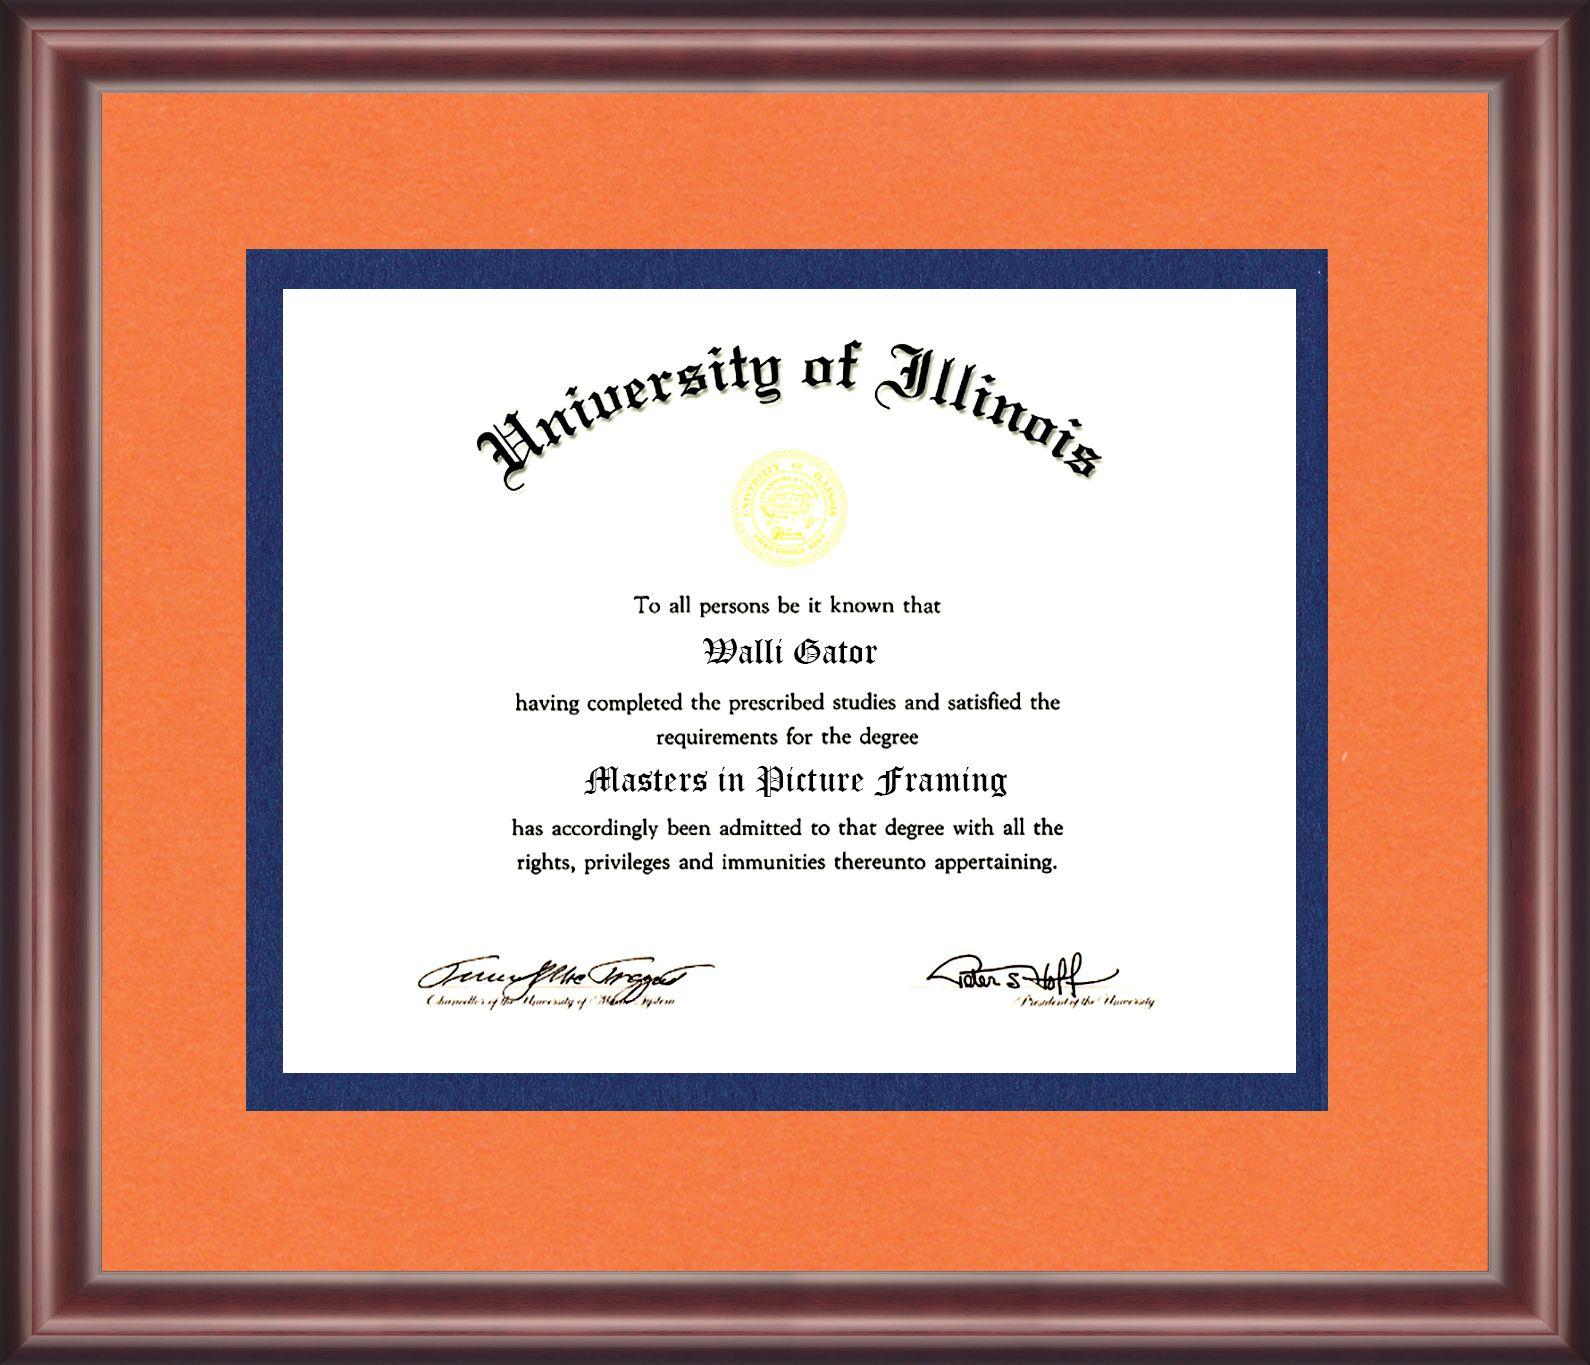 University Of Illinois Diploma Frame Diploma Frame University